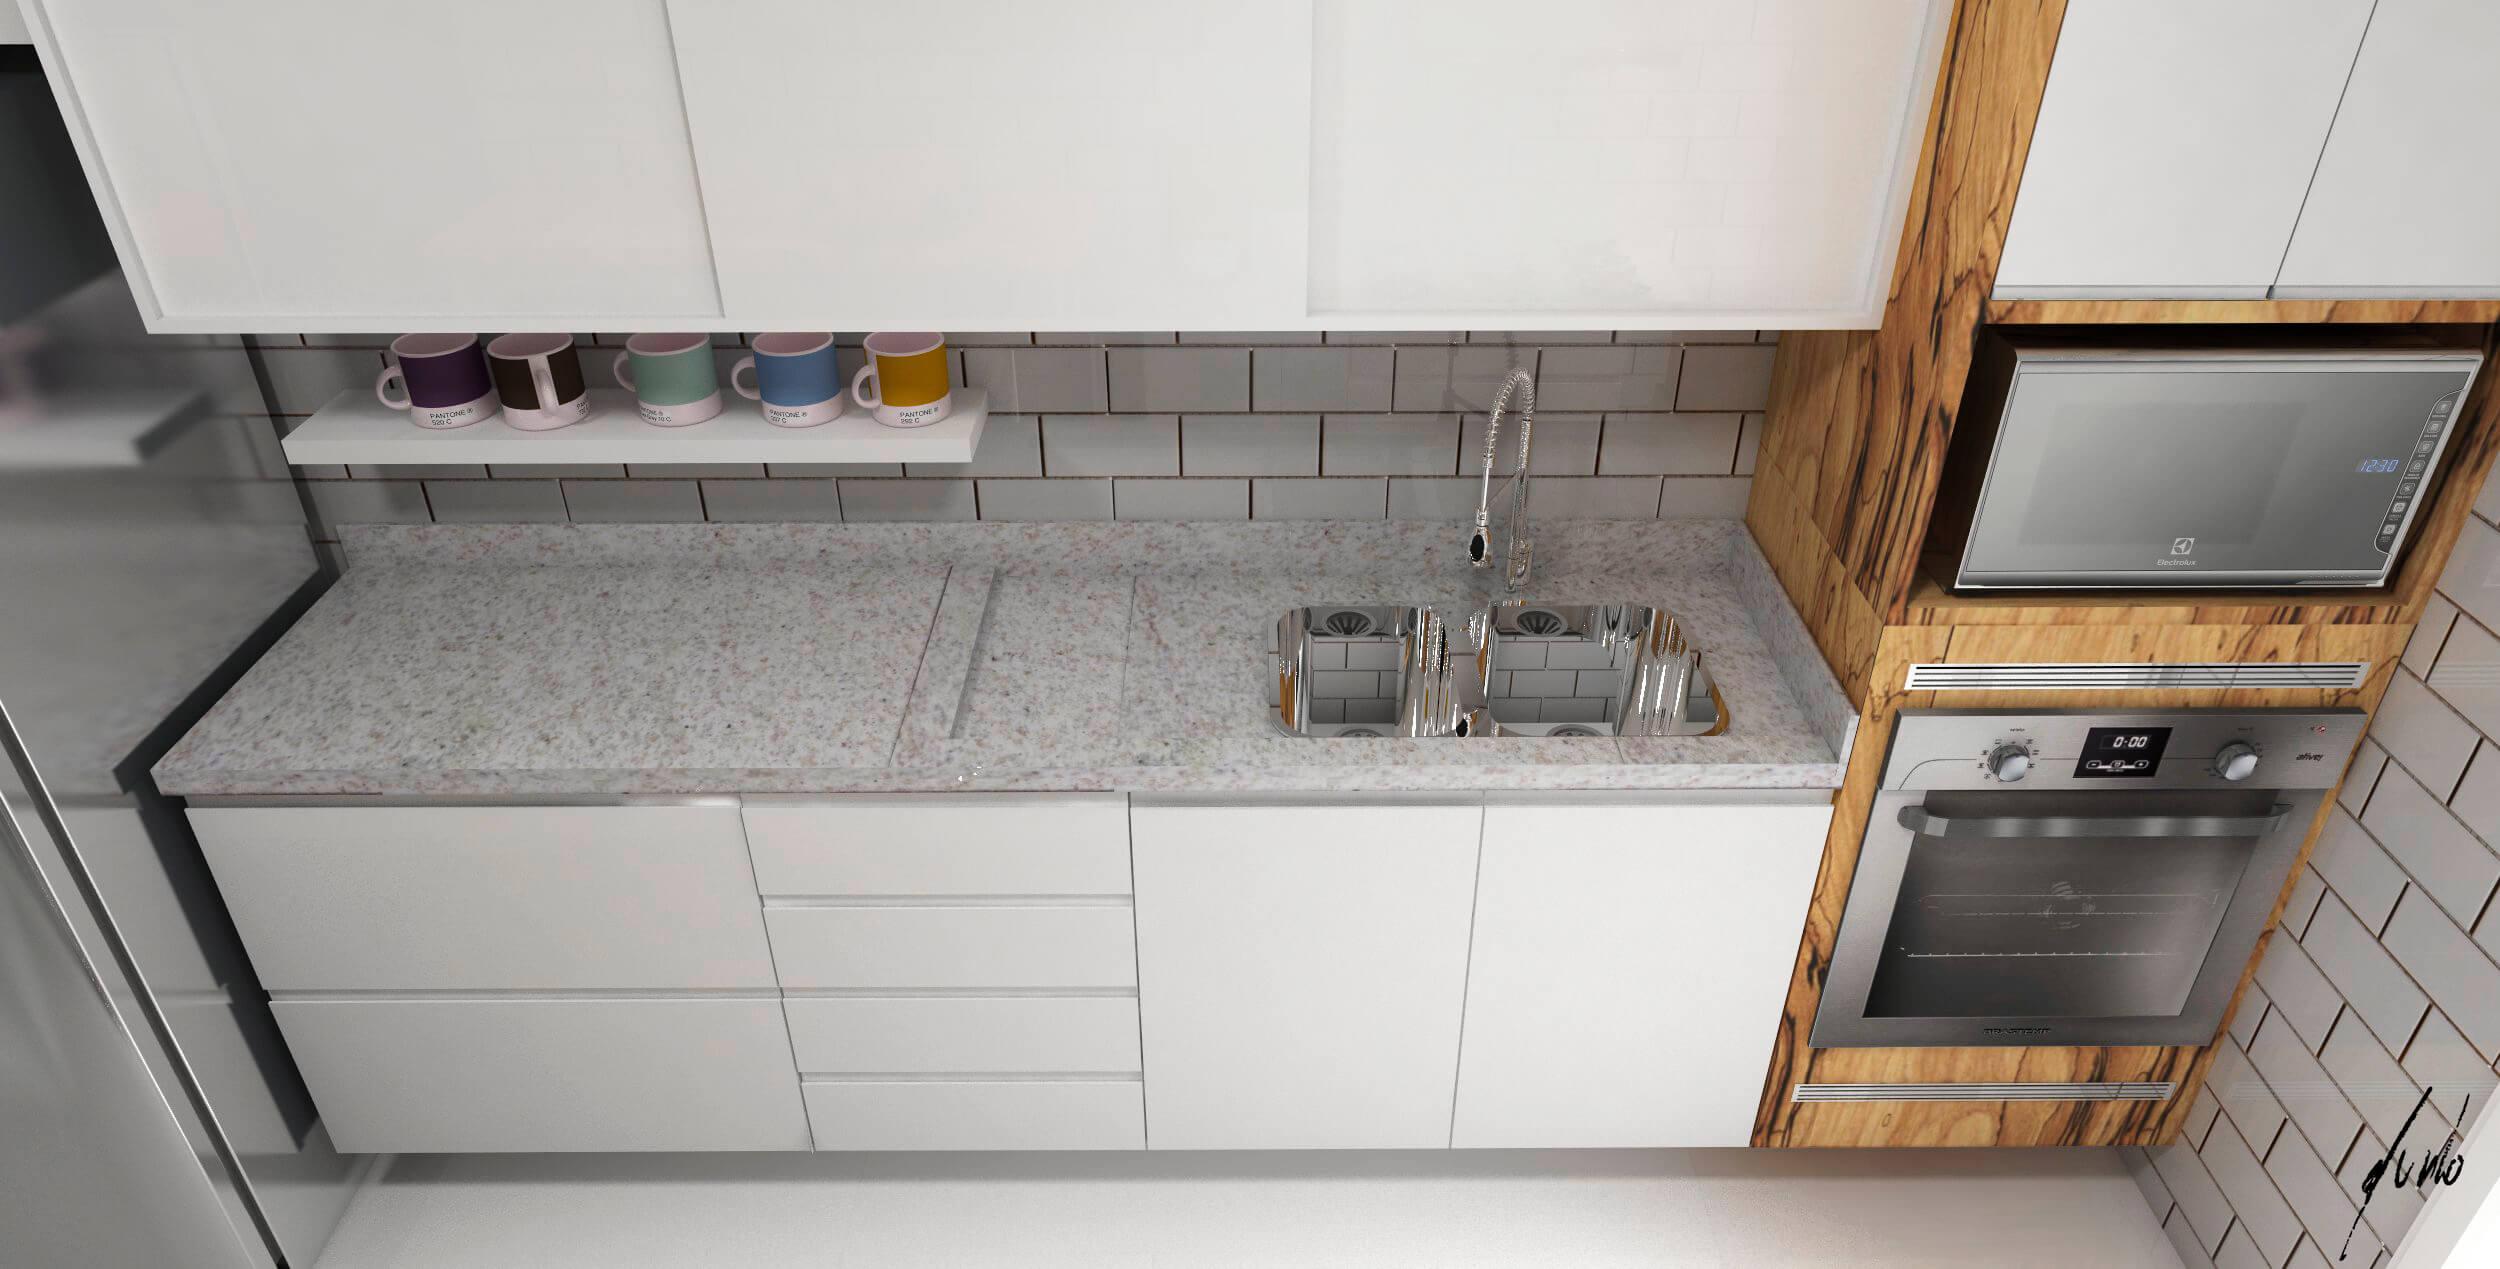 projeto por Murilo Zadulski Designer de interiores em curitiba img09 #90663B 2500 1269